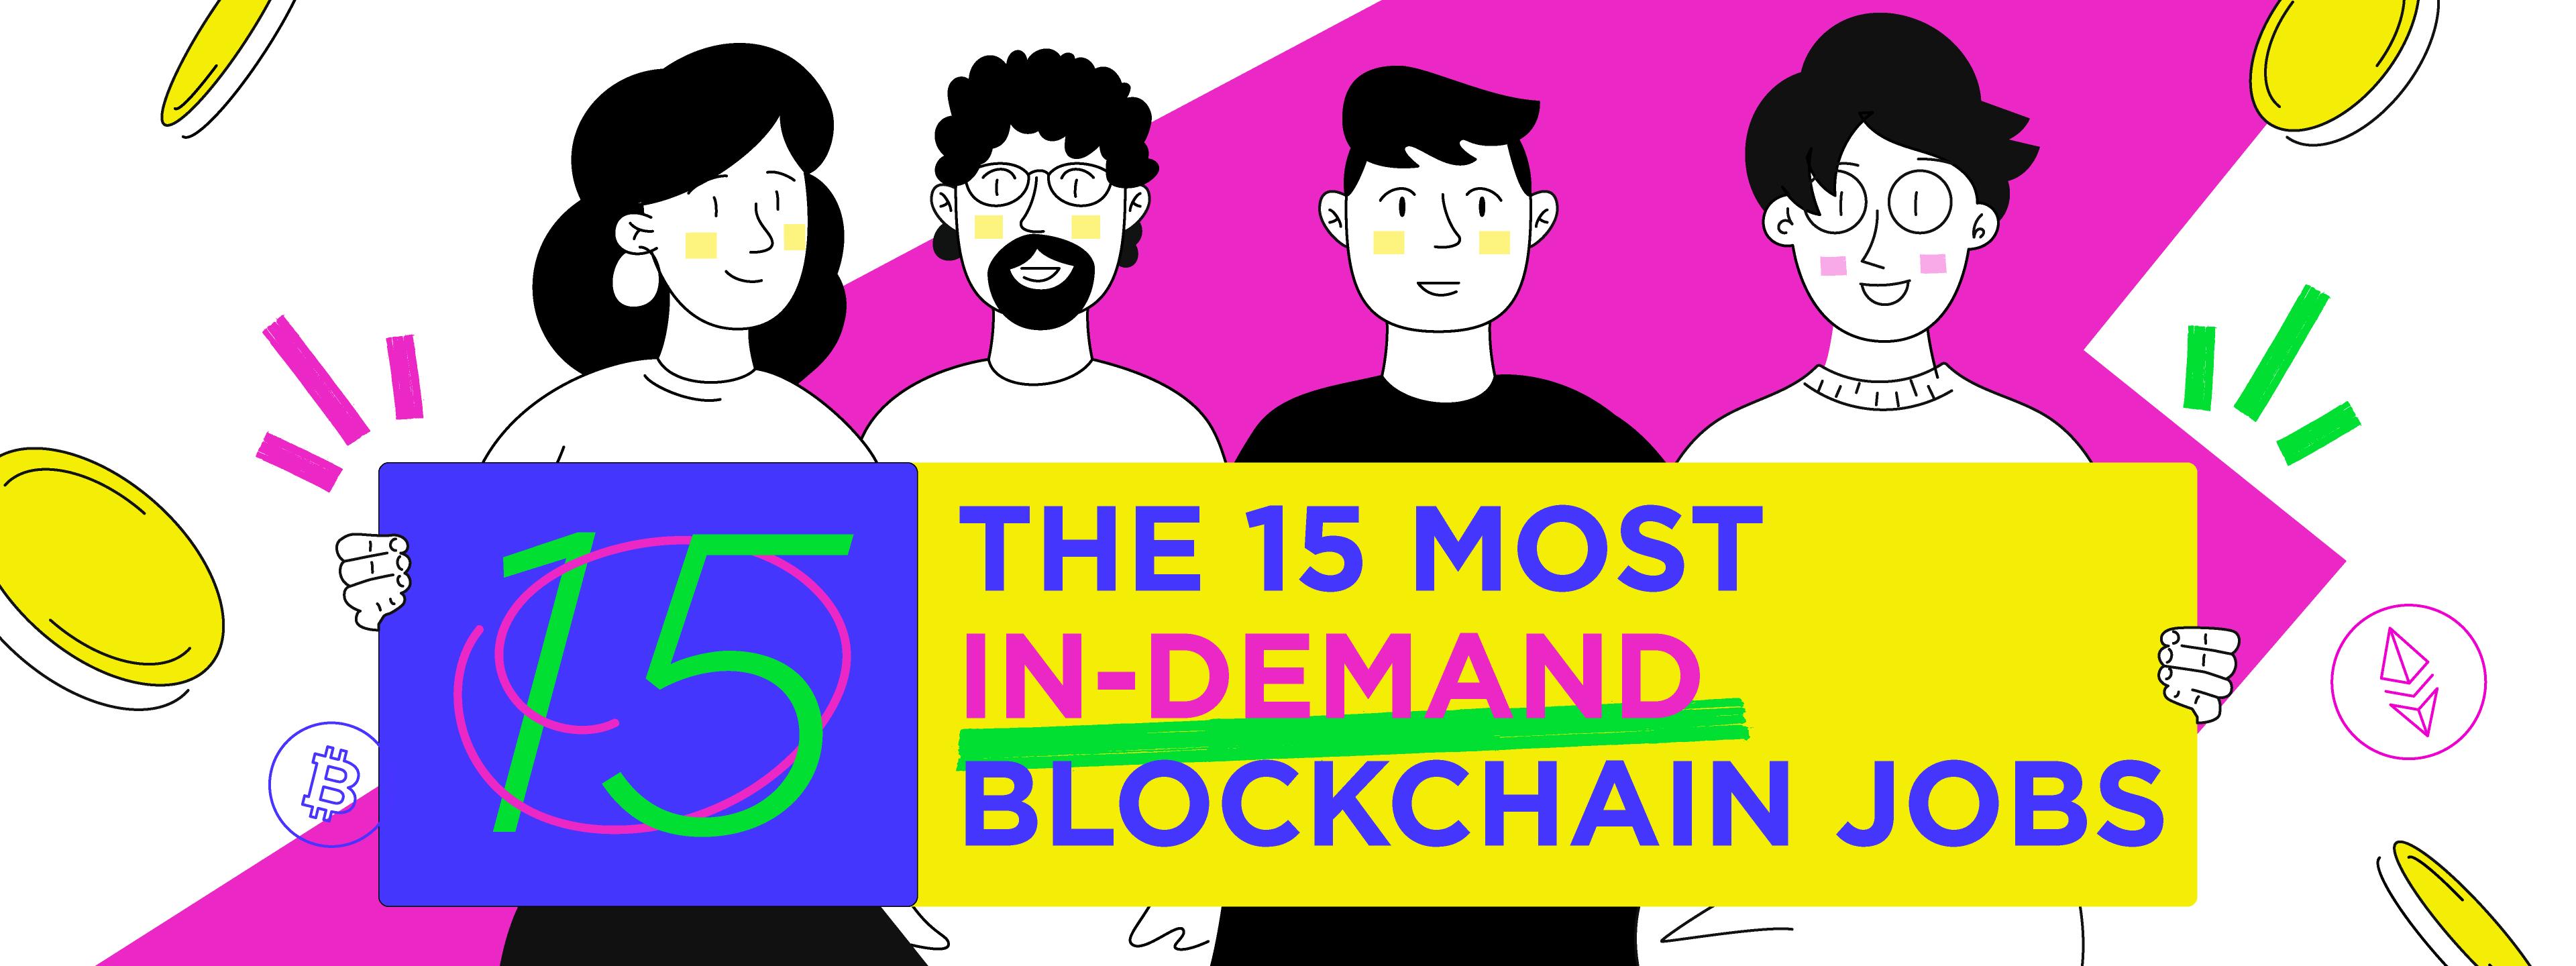 The 15 Most In-Demand Blockchain Job